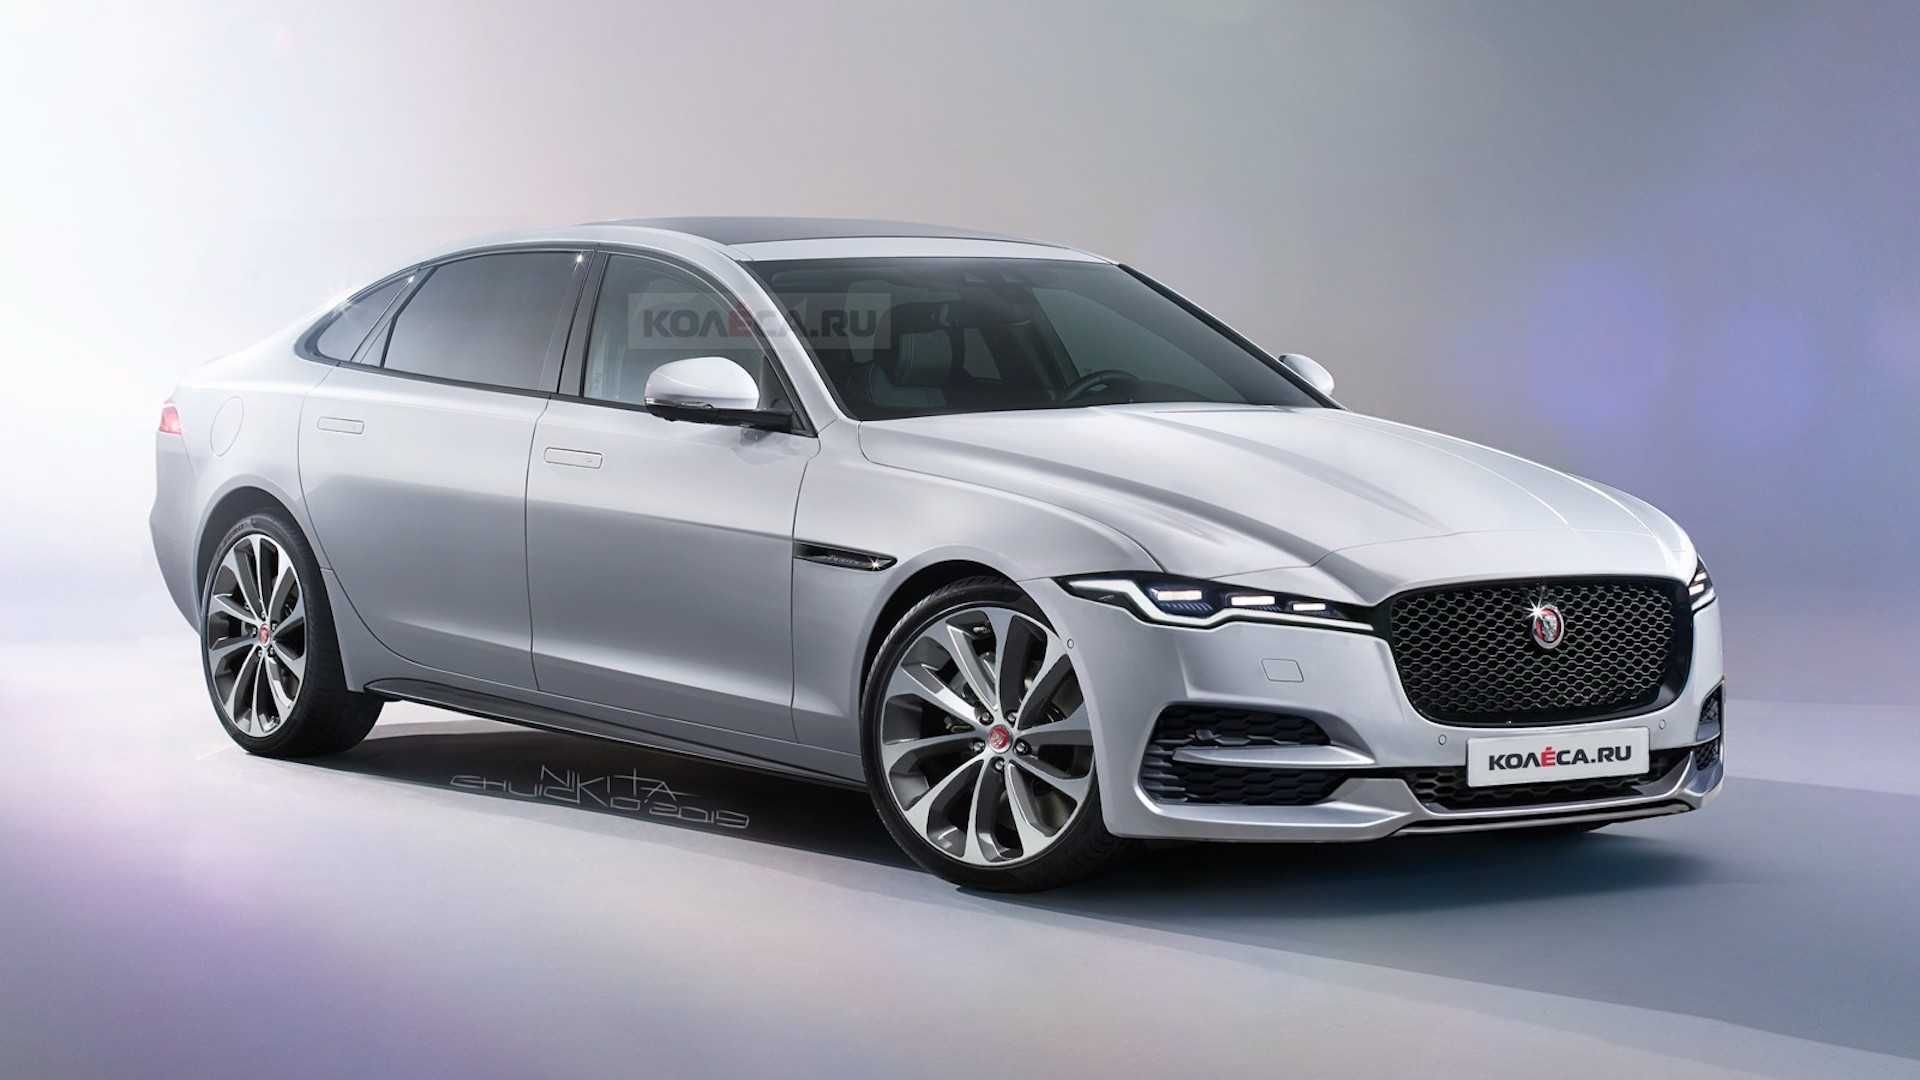 jaguar xe 2021 style in 2020  jaguar xj jaguar xe new